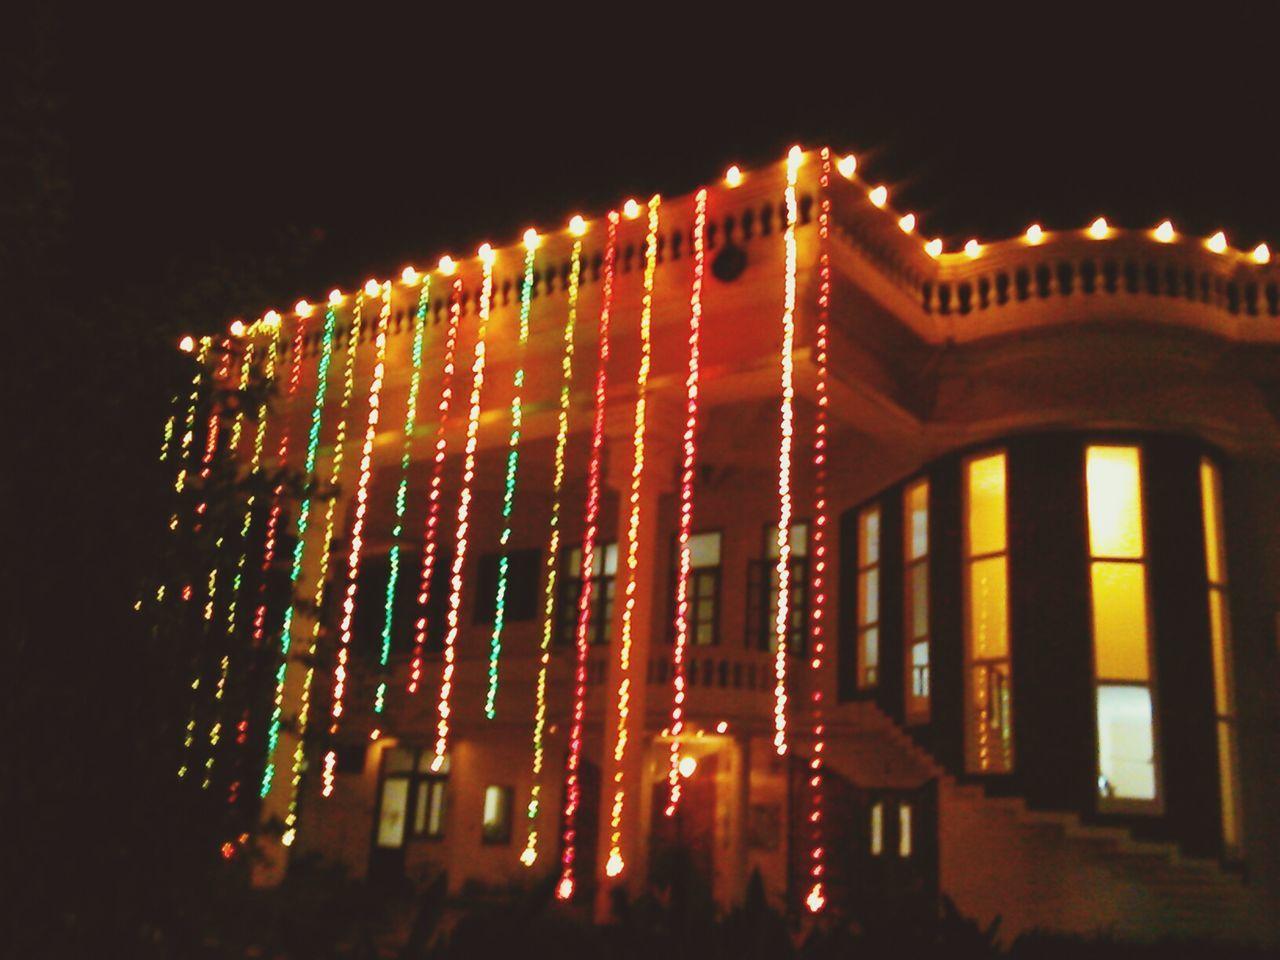 Diwali🎆 Diwali Lights diwali2016